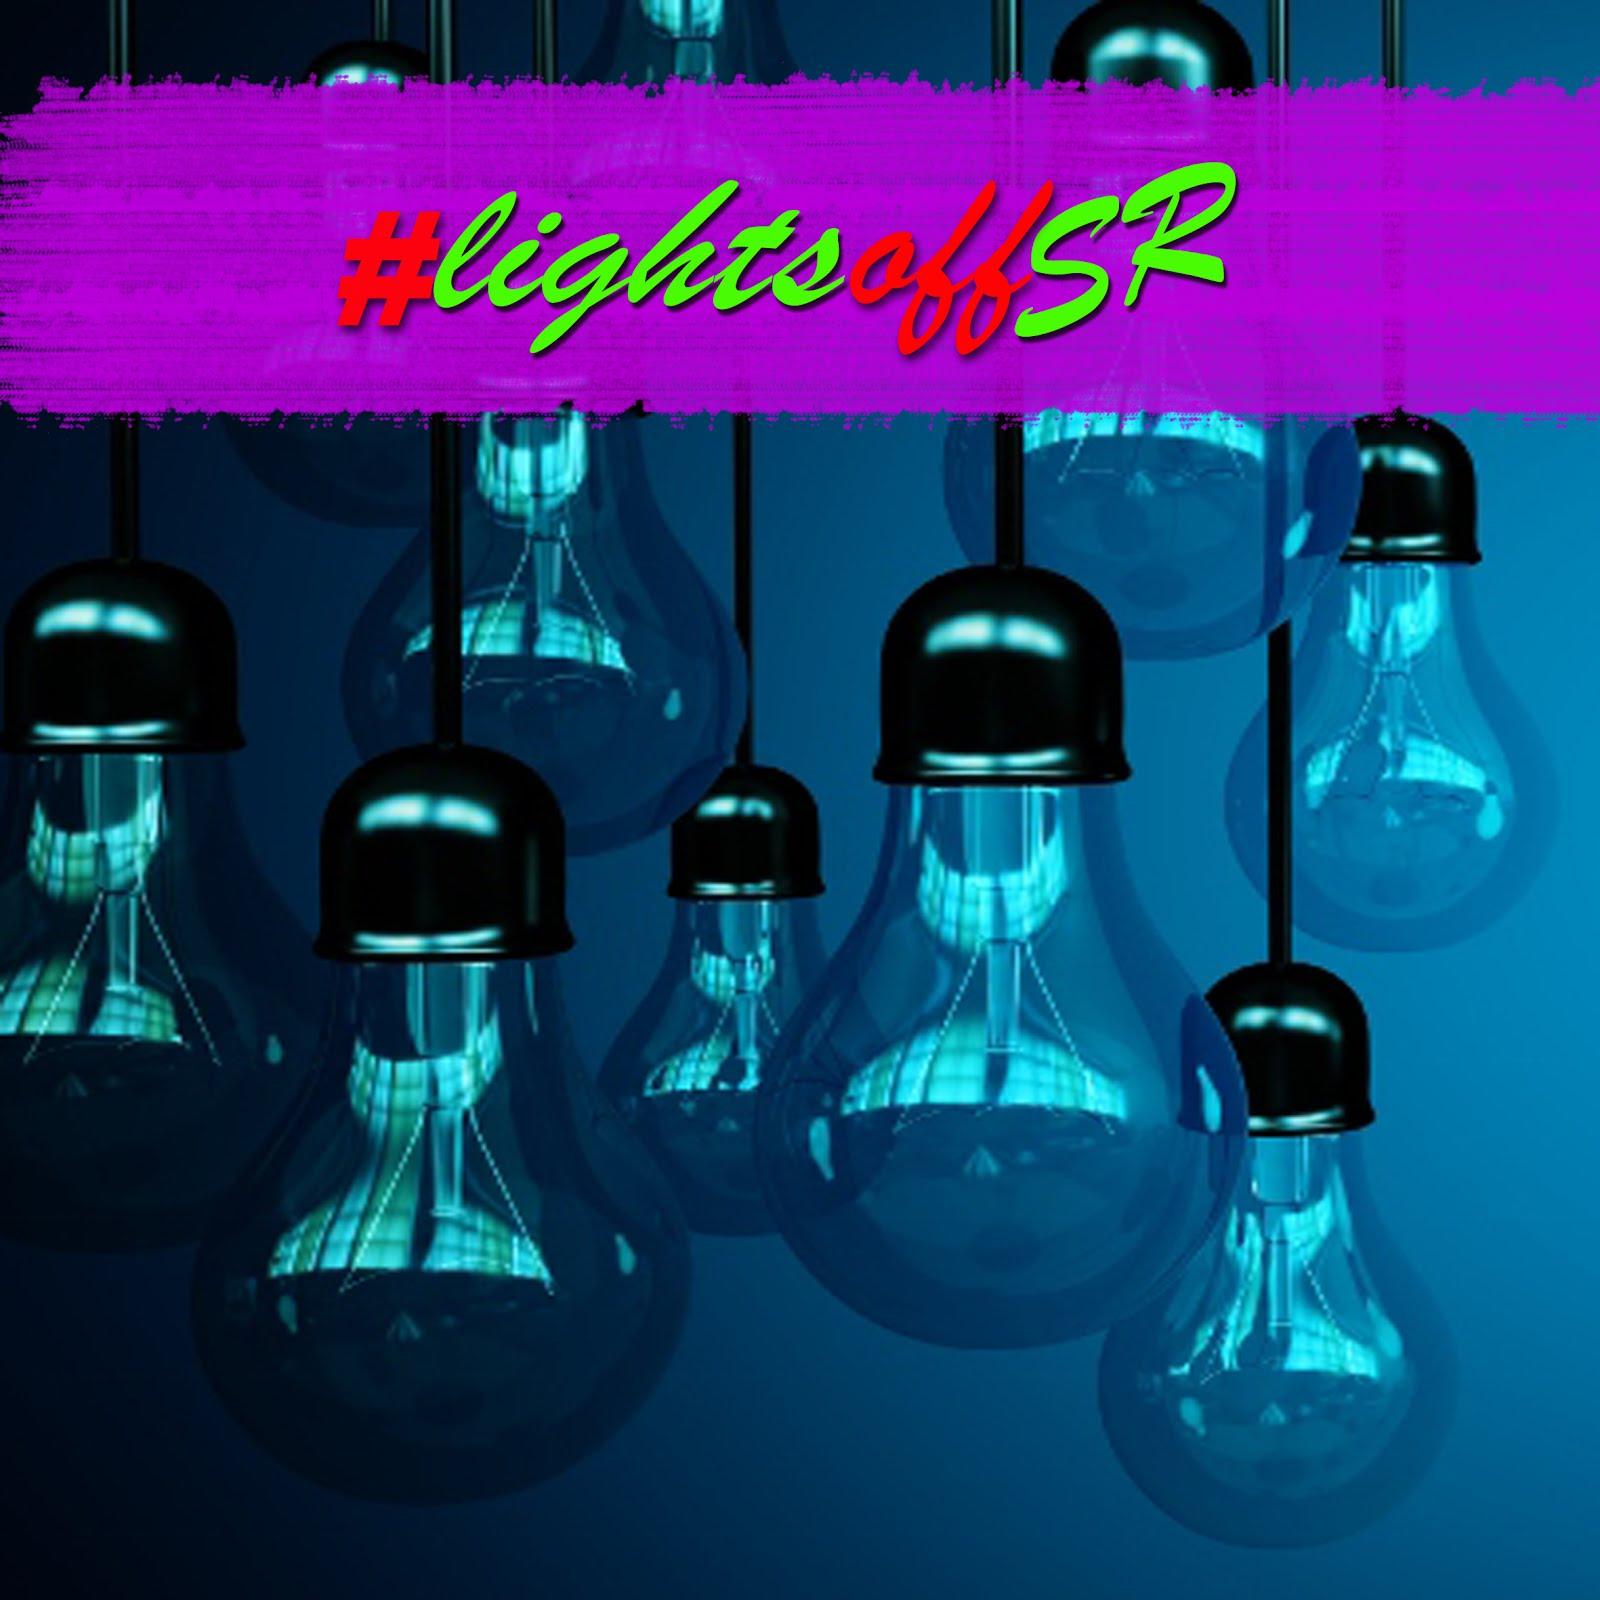 #LIGHTSOFFSR - Petizione su change.org